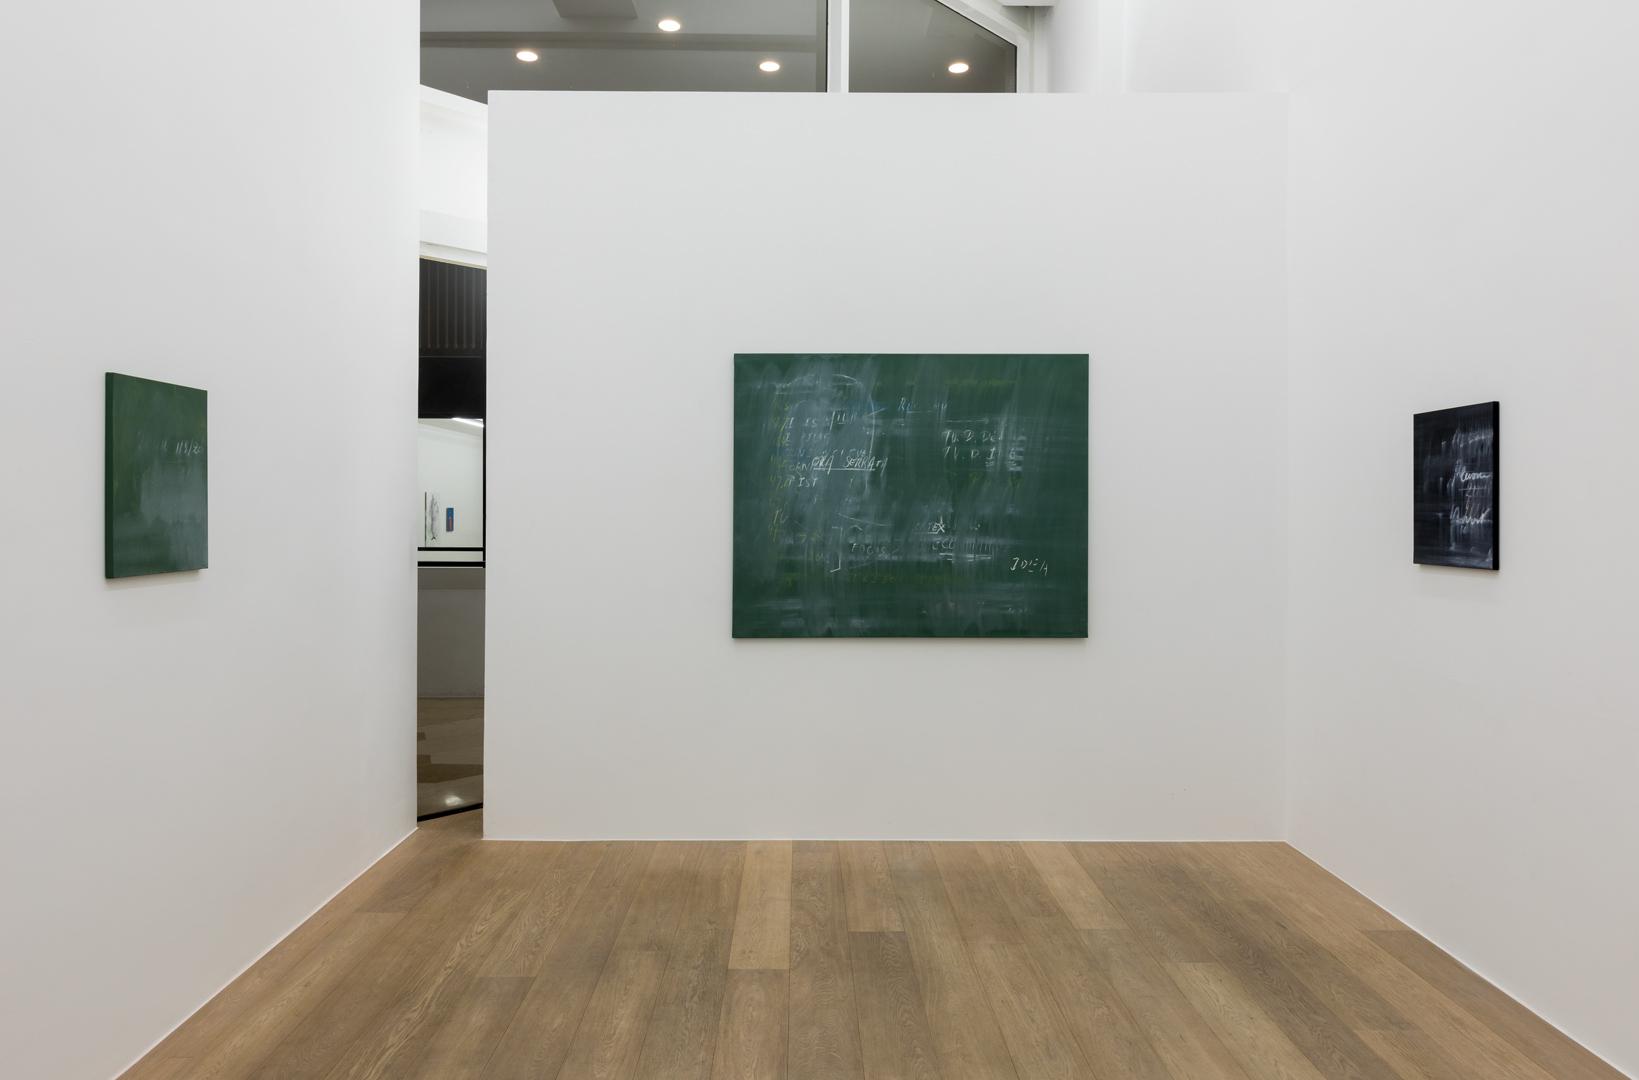 Alain Bornain. Blackboards Exhibition view. Room 2